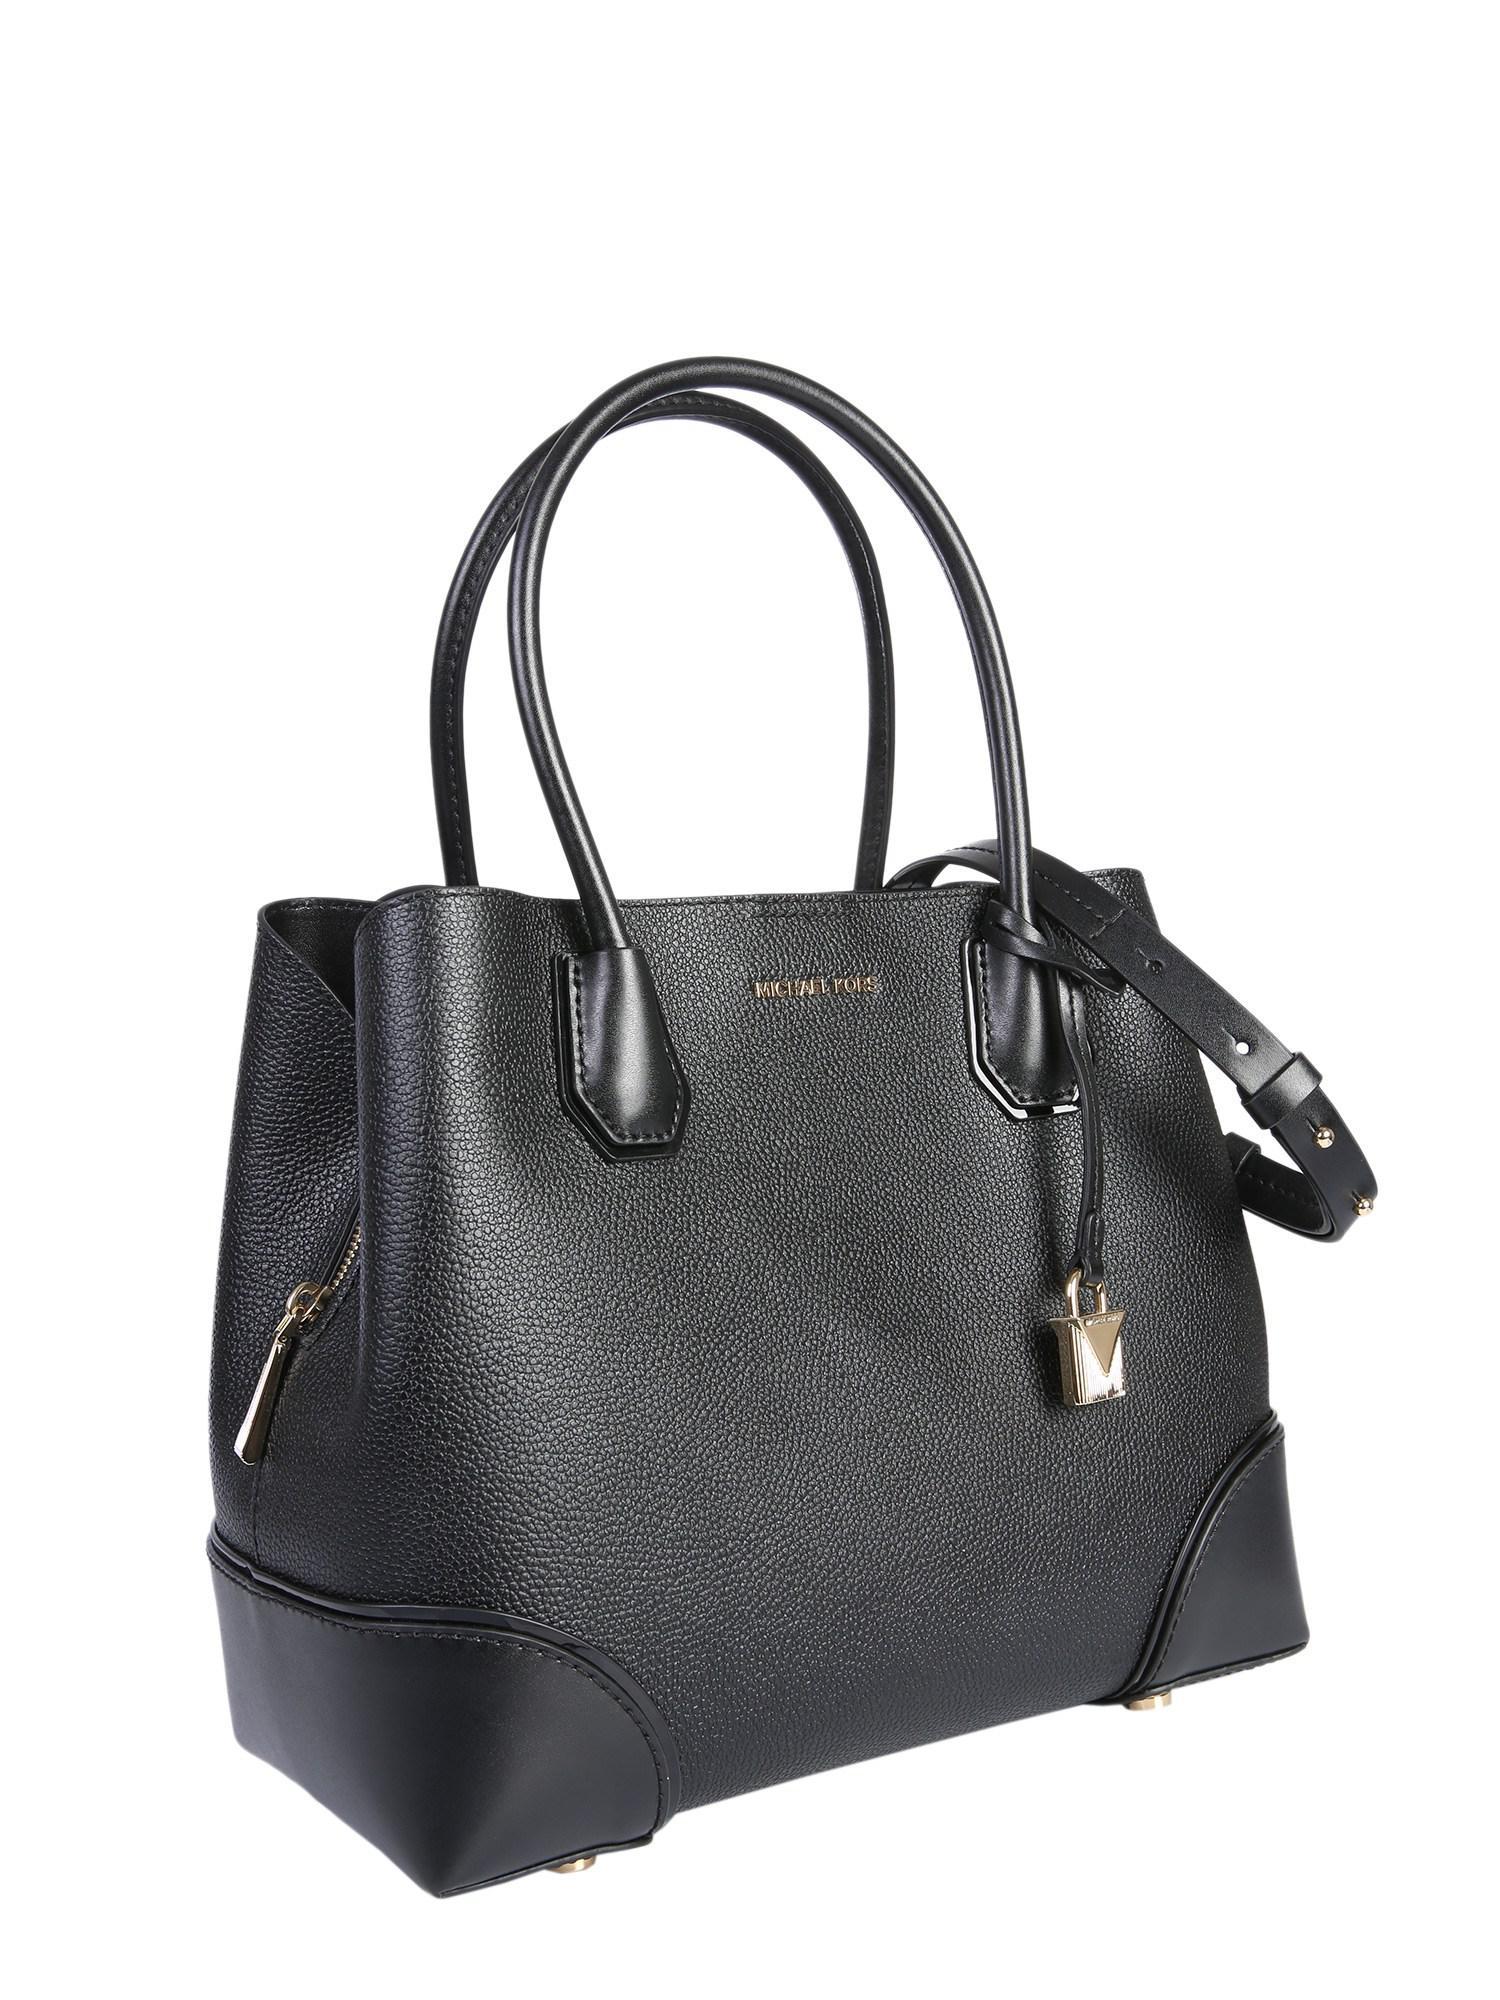 MICHAEL Michael Kors. Women s Black Medium Mercer Gallery Hammered Leather  Tote Bag 3fdb23182